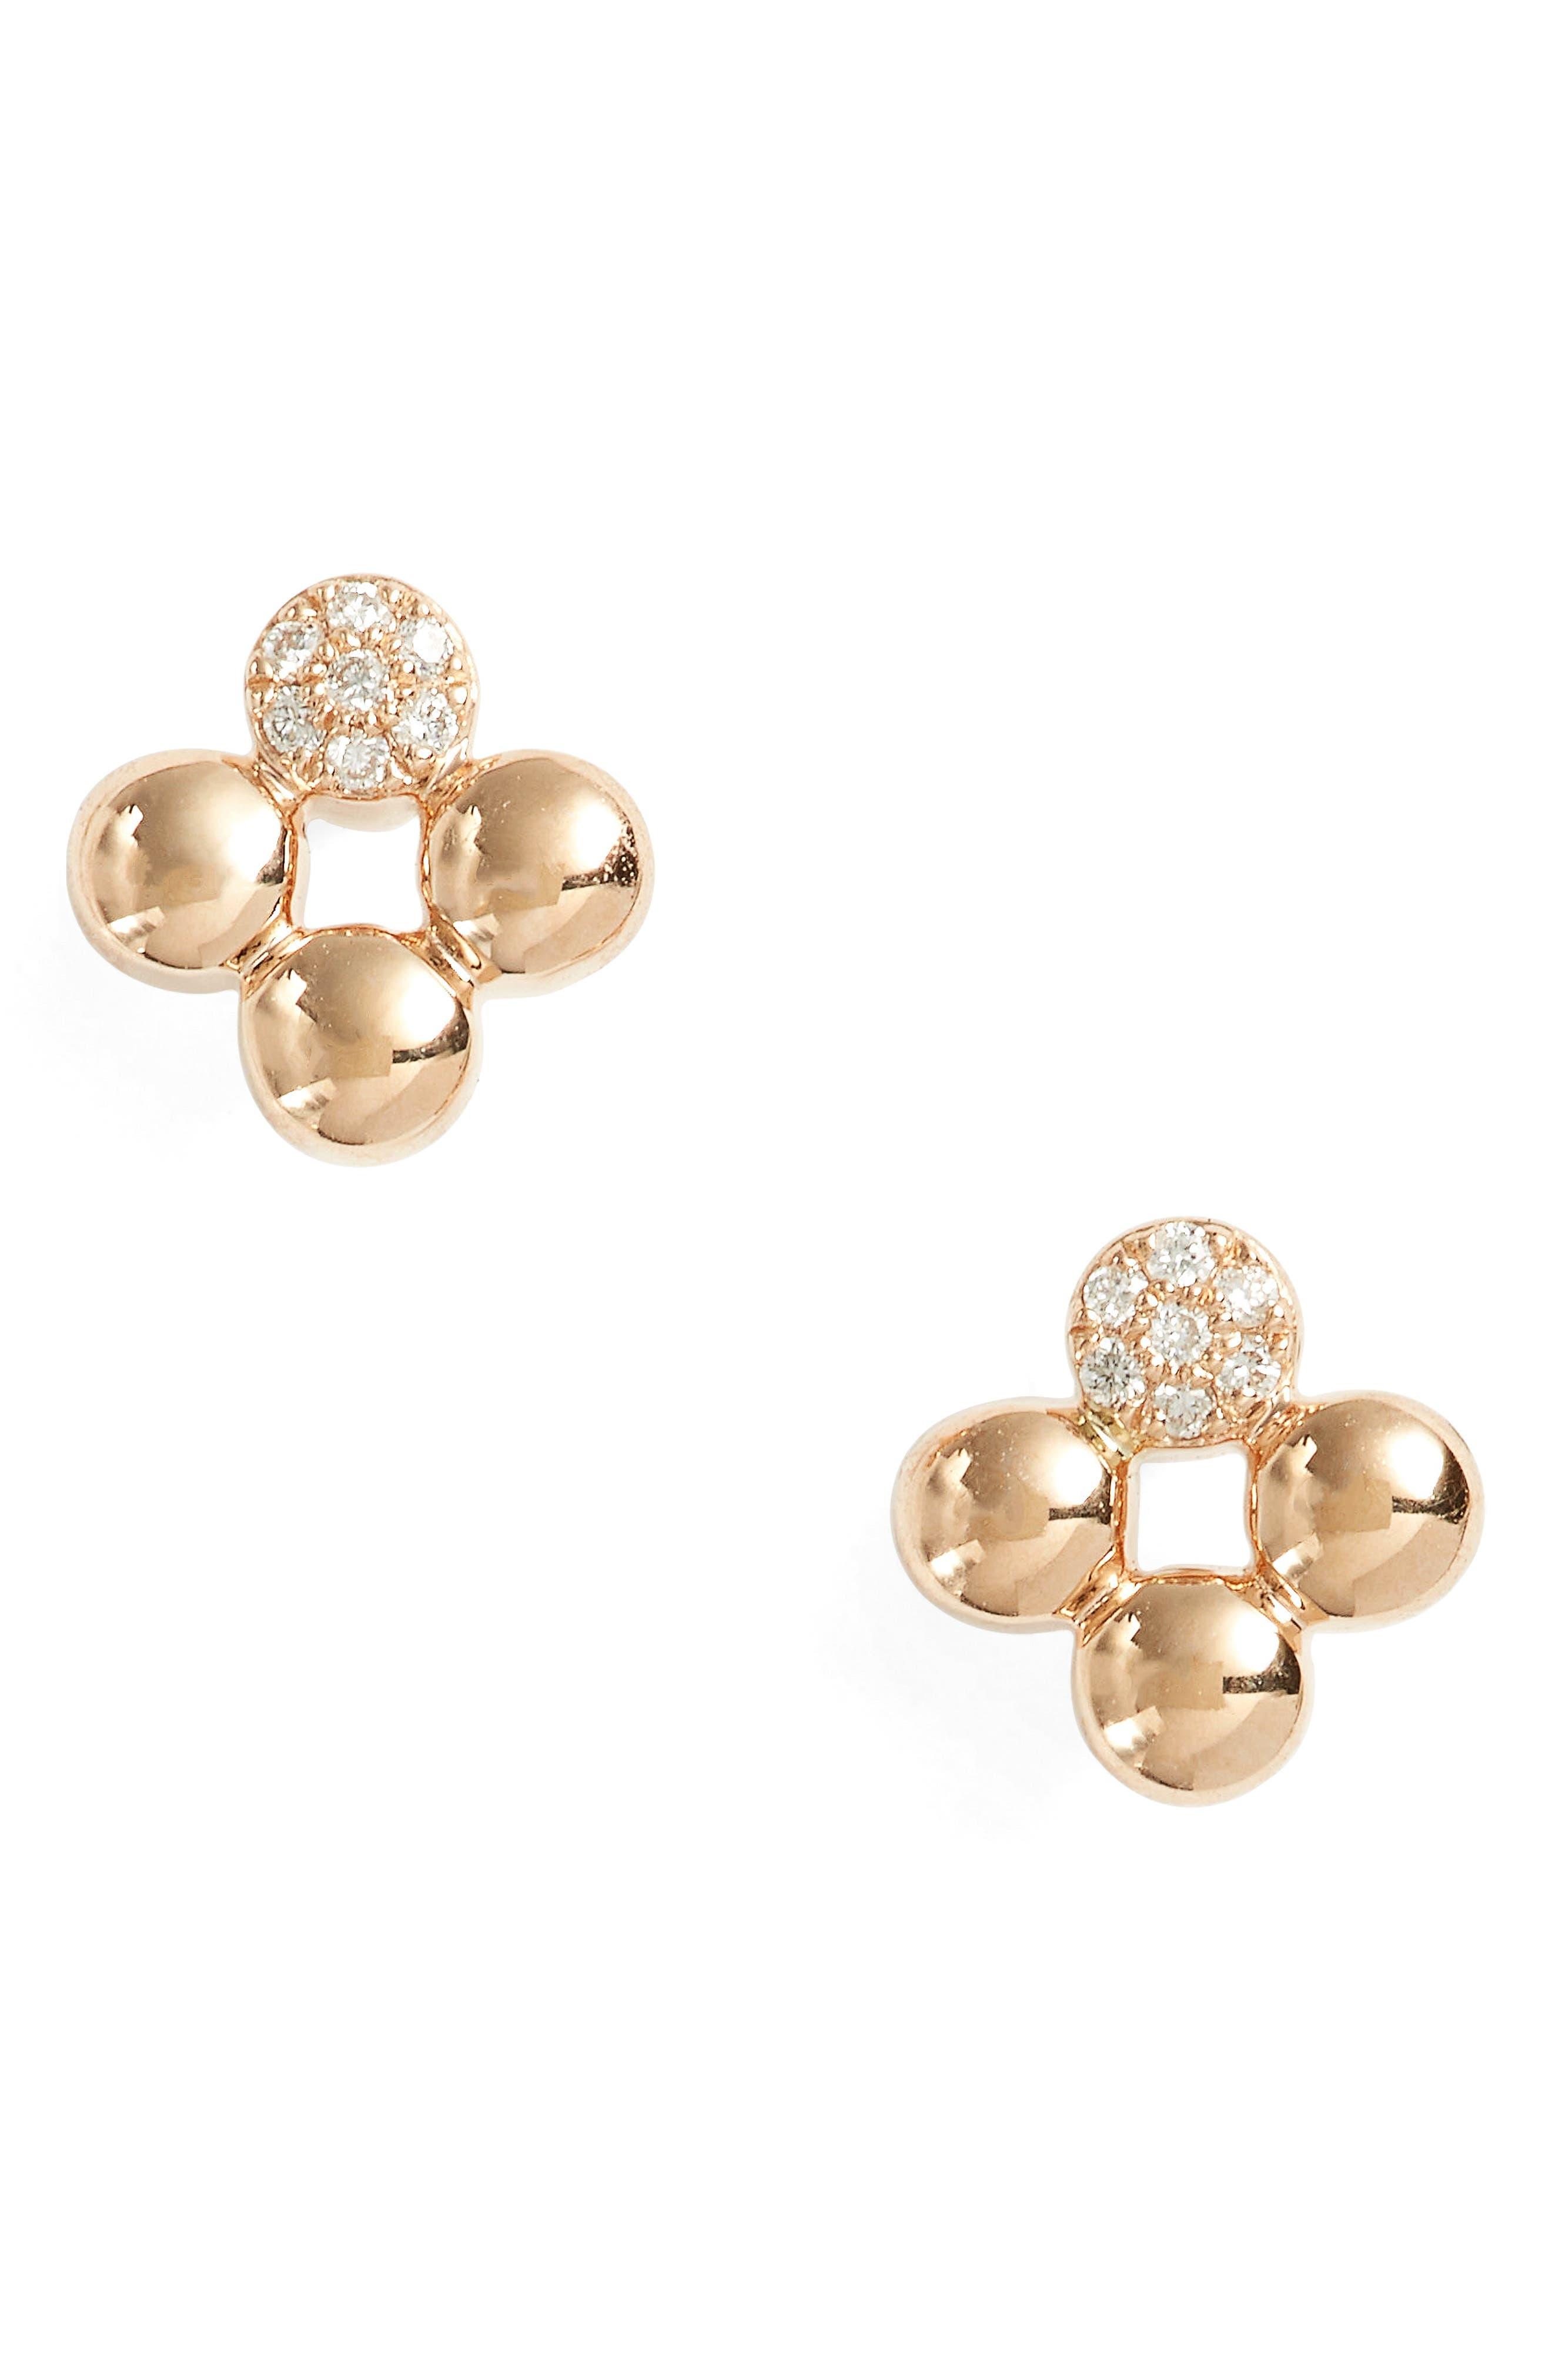 Main Image - Dana Rebecca Designs Poppy Rae Clover Diamond Stud Earrings